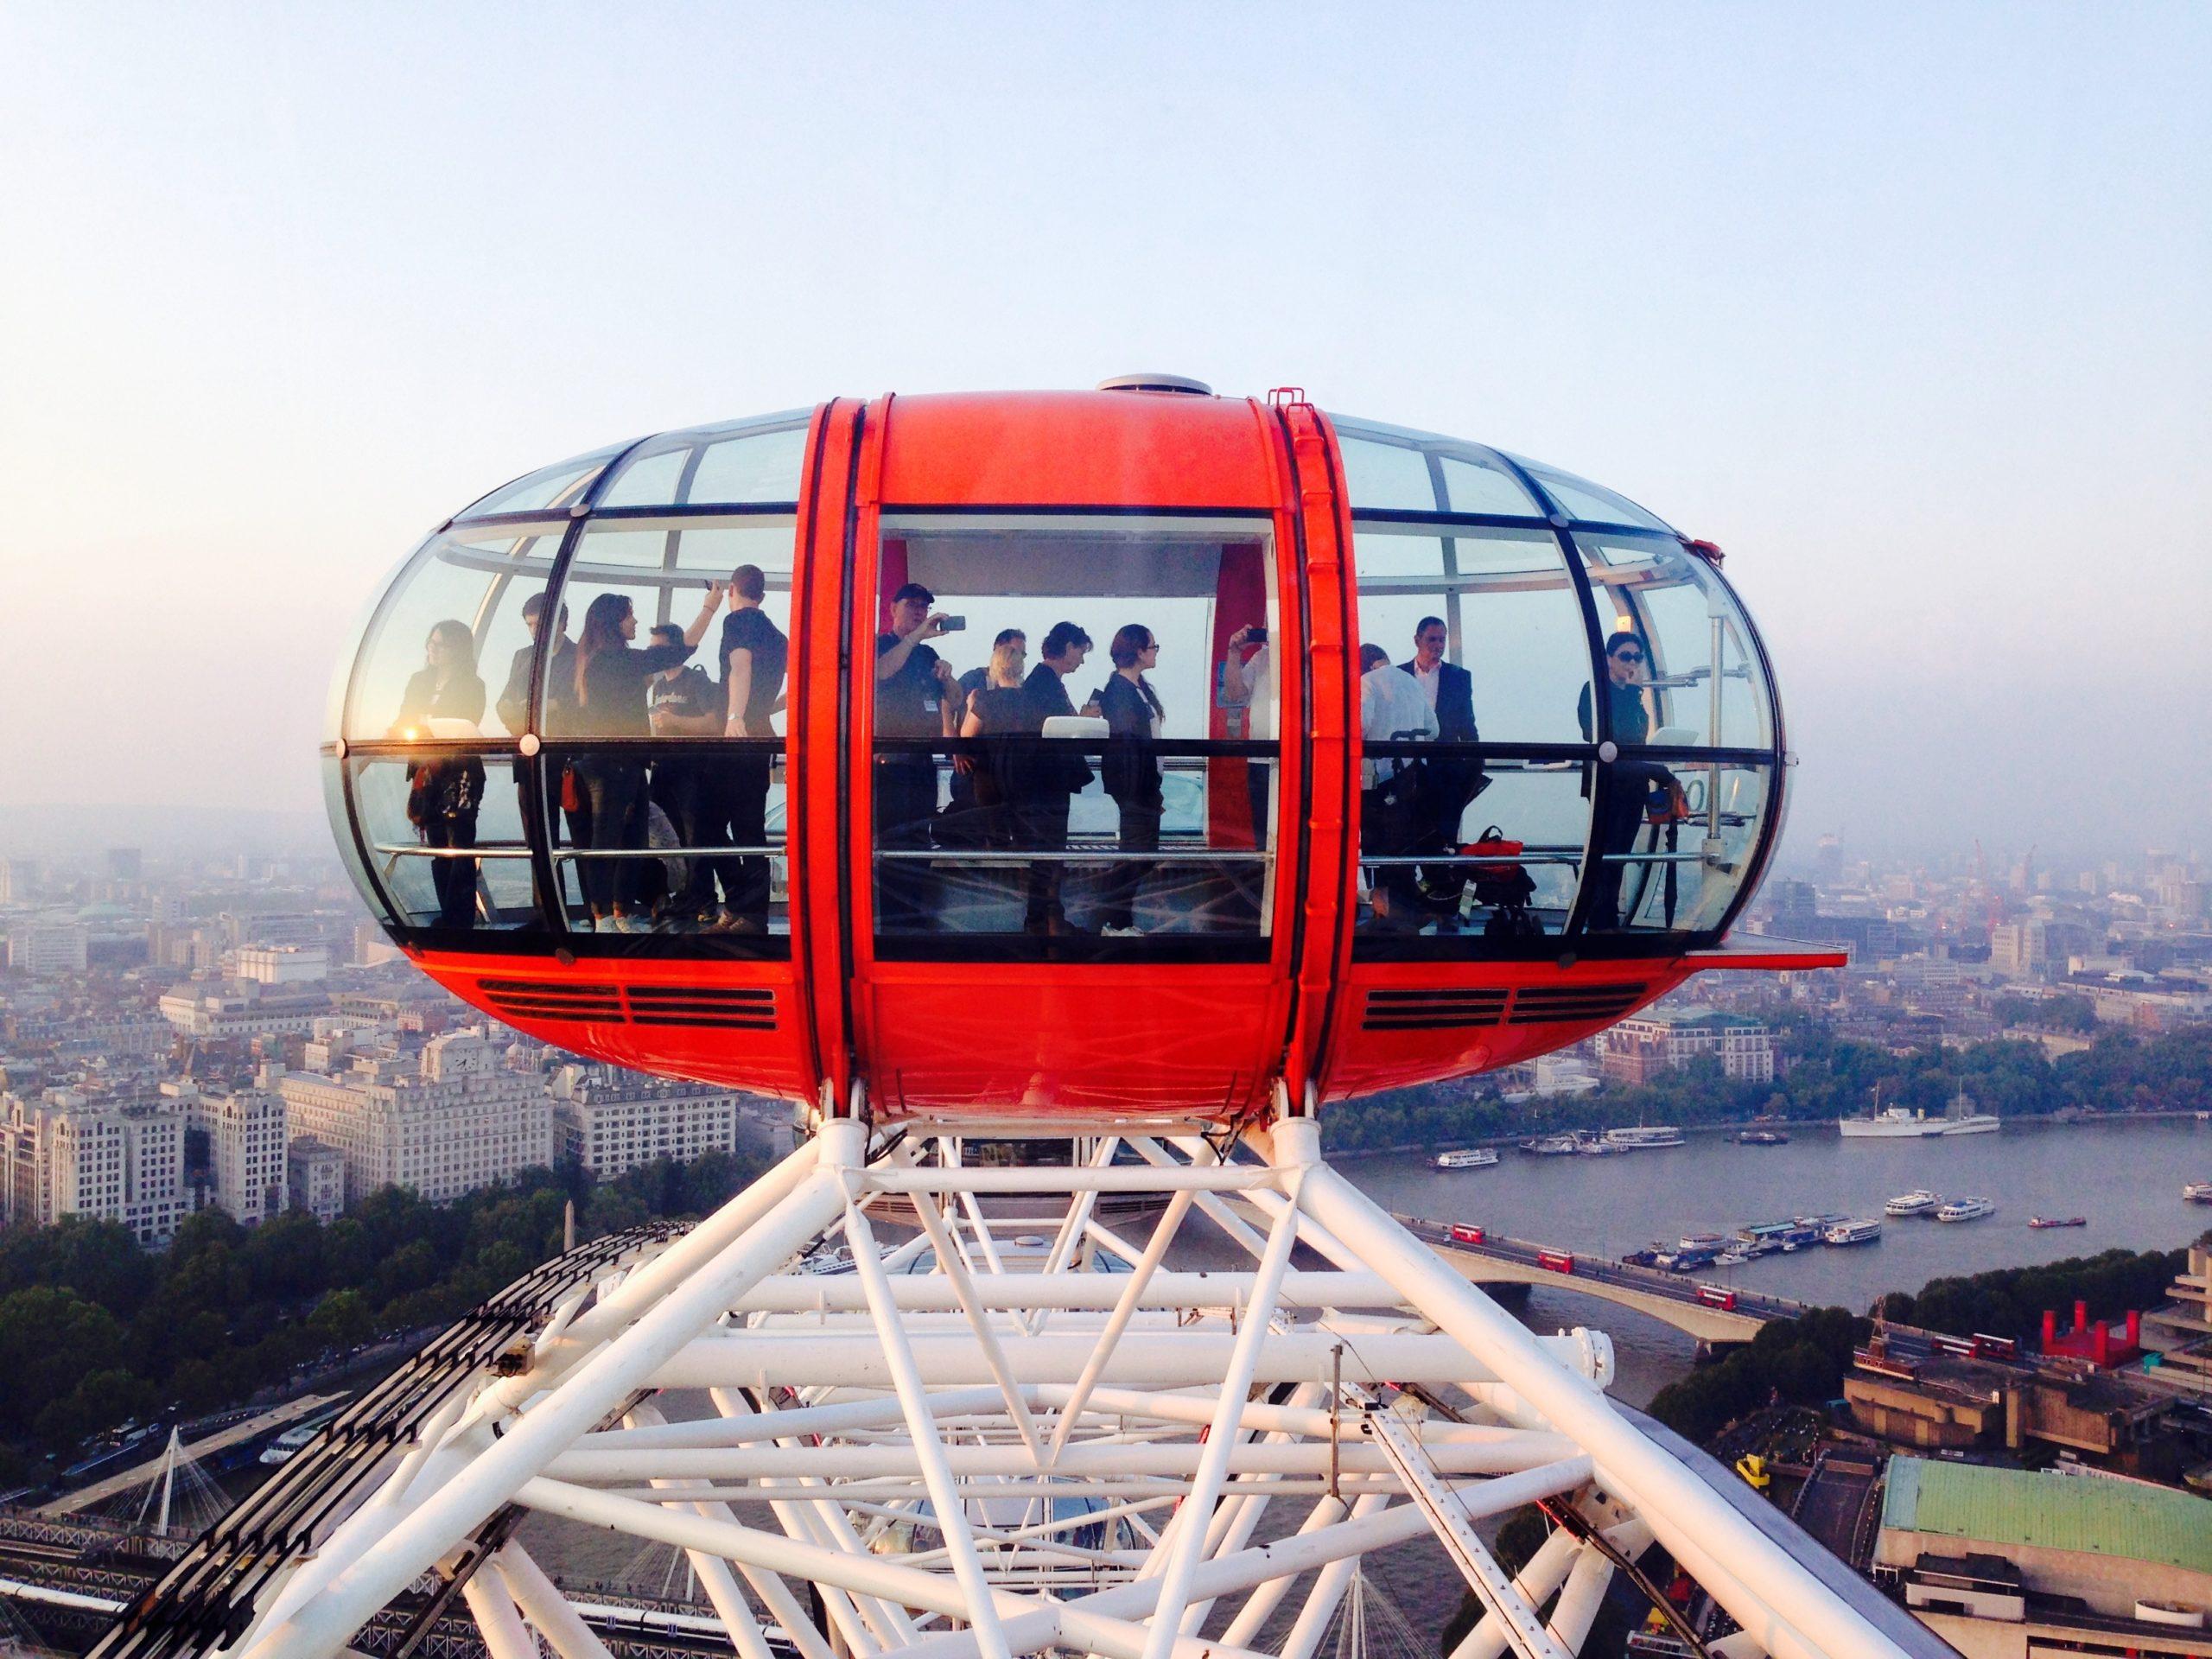 London Eye, Large Ferris Wheel on Beautiful Summer Day